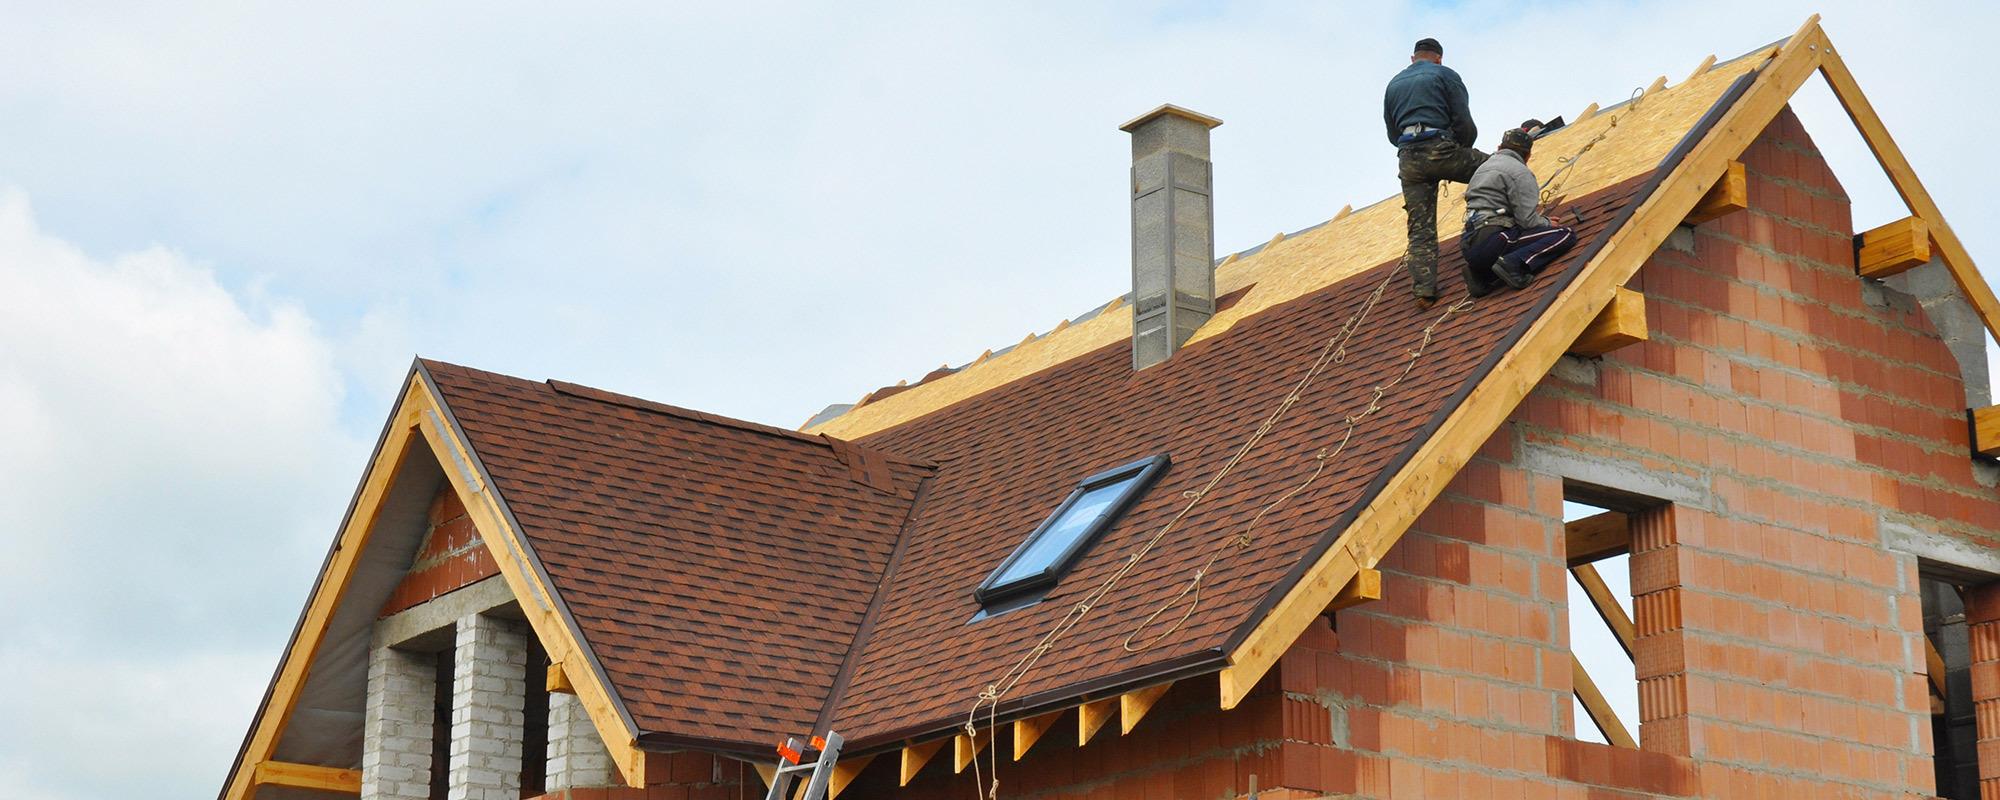 rofessional working on roof repair